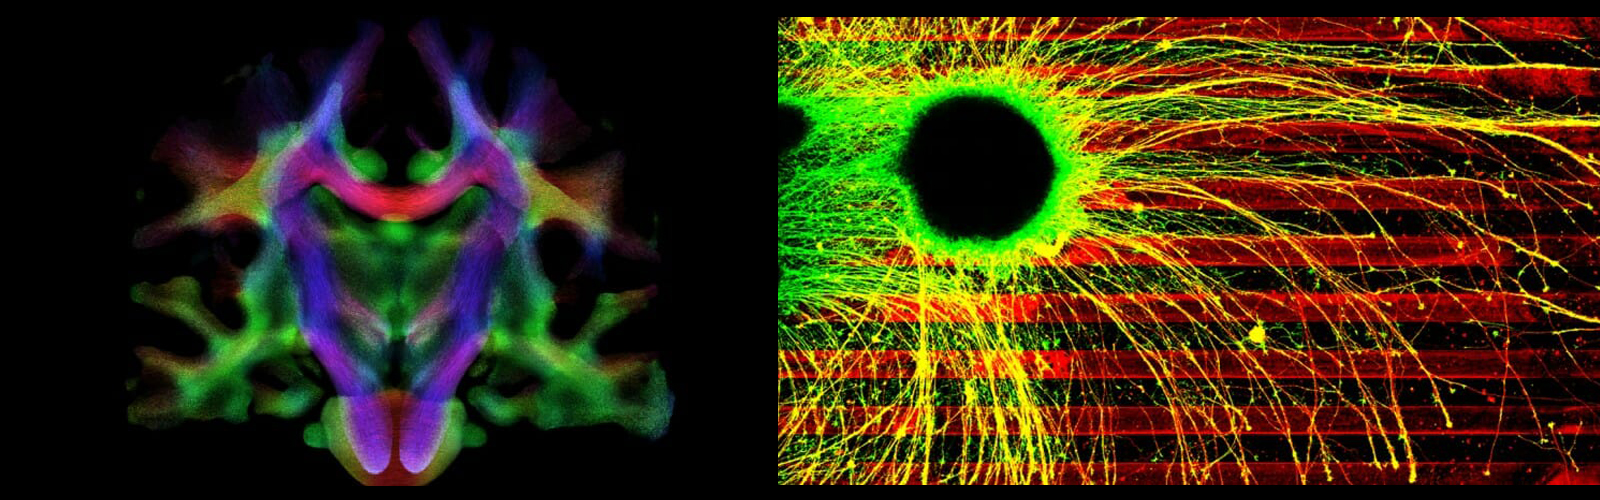 Cool Sciences images